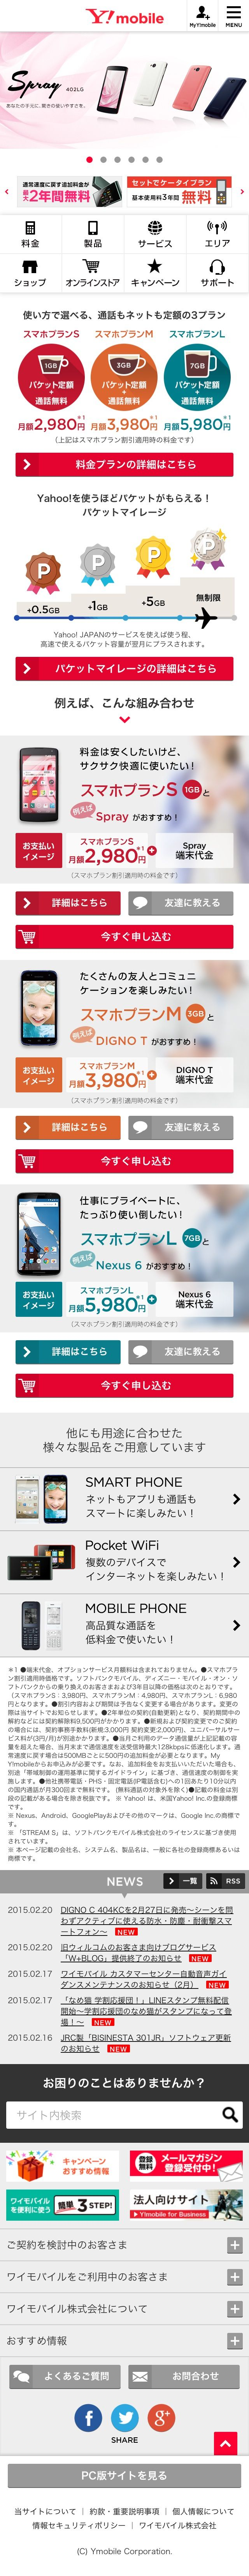 http://www.ymobile.jp/index.html